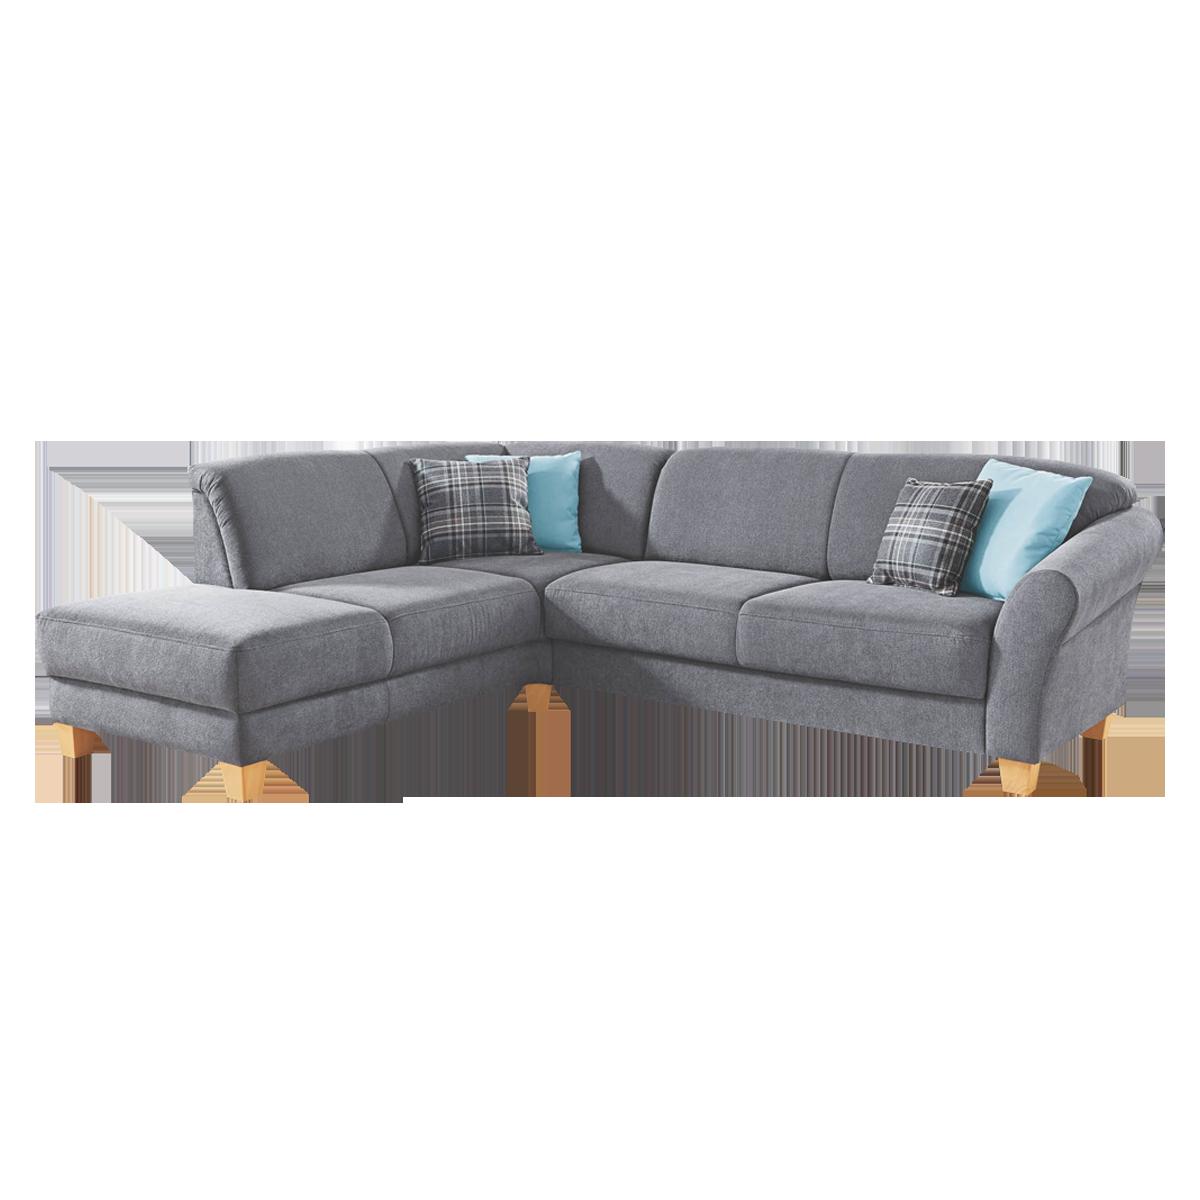 Full Size of Sofa 3 Sitzer Grau Mit Schlaffunktion Retro Kingsley 3 Sitzer Couch Nino Schwarz/grau 2 Und Ikea Rattan Samt Leder Louisiana (3 Sitzer Polster Grau) Ecksofa Sofa Sofa 3 Sitzer Grau